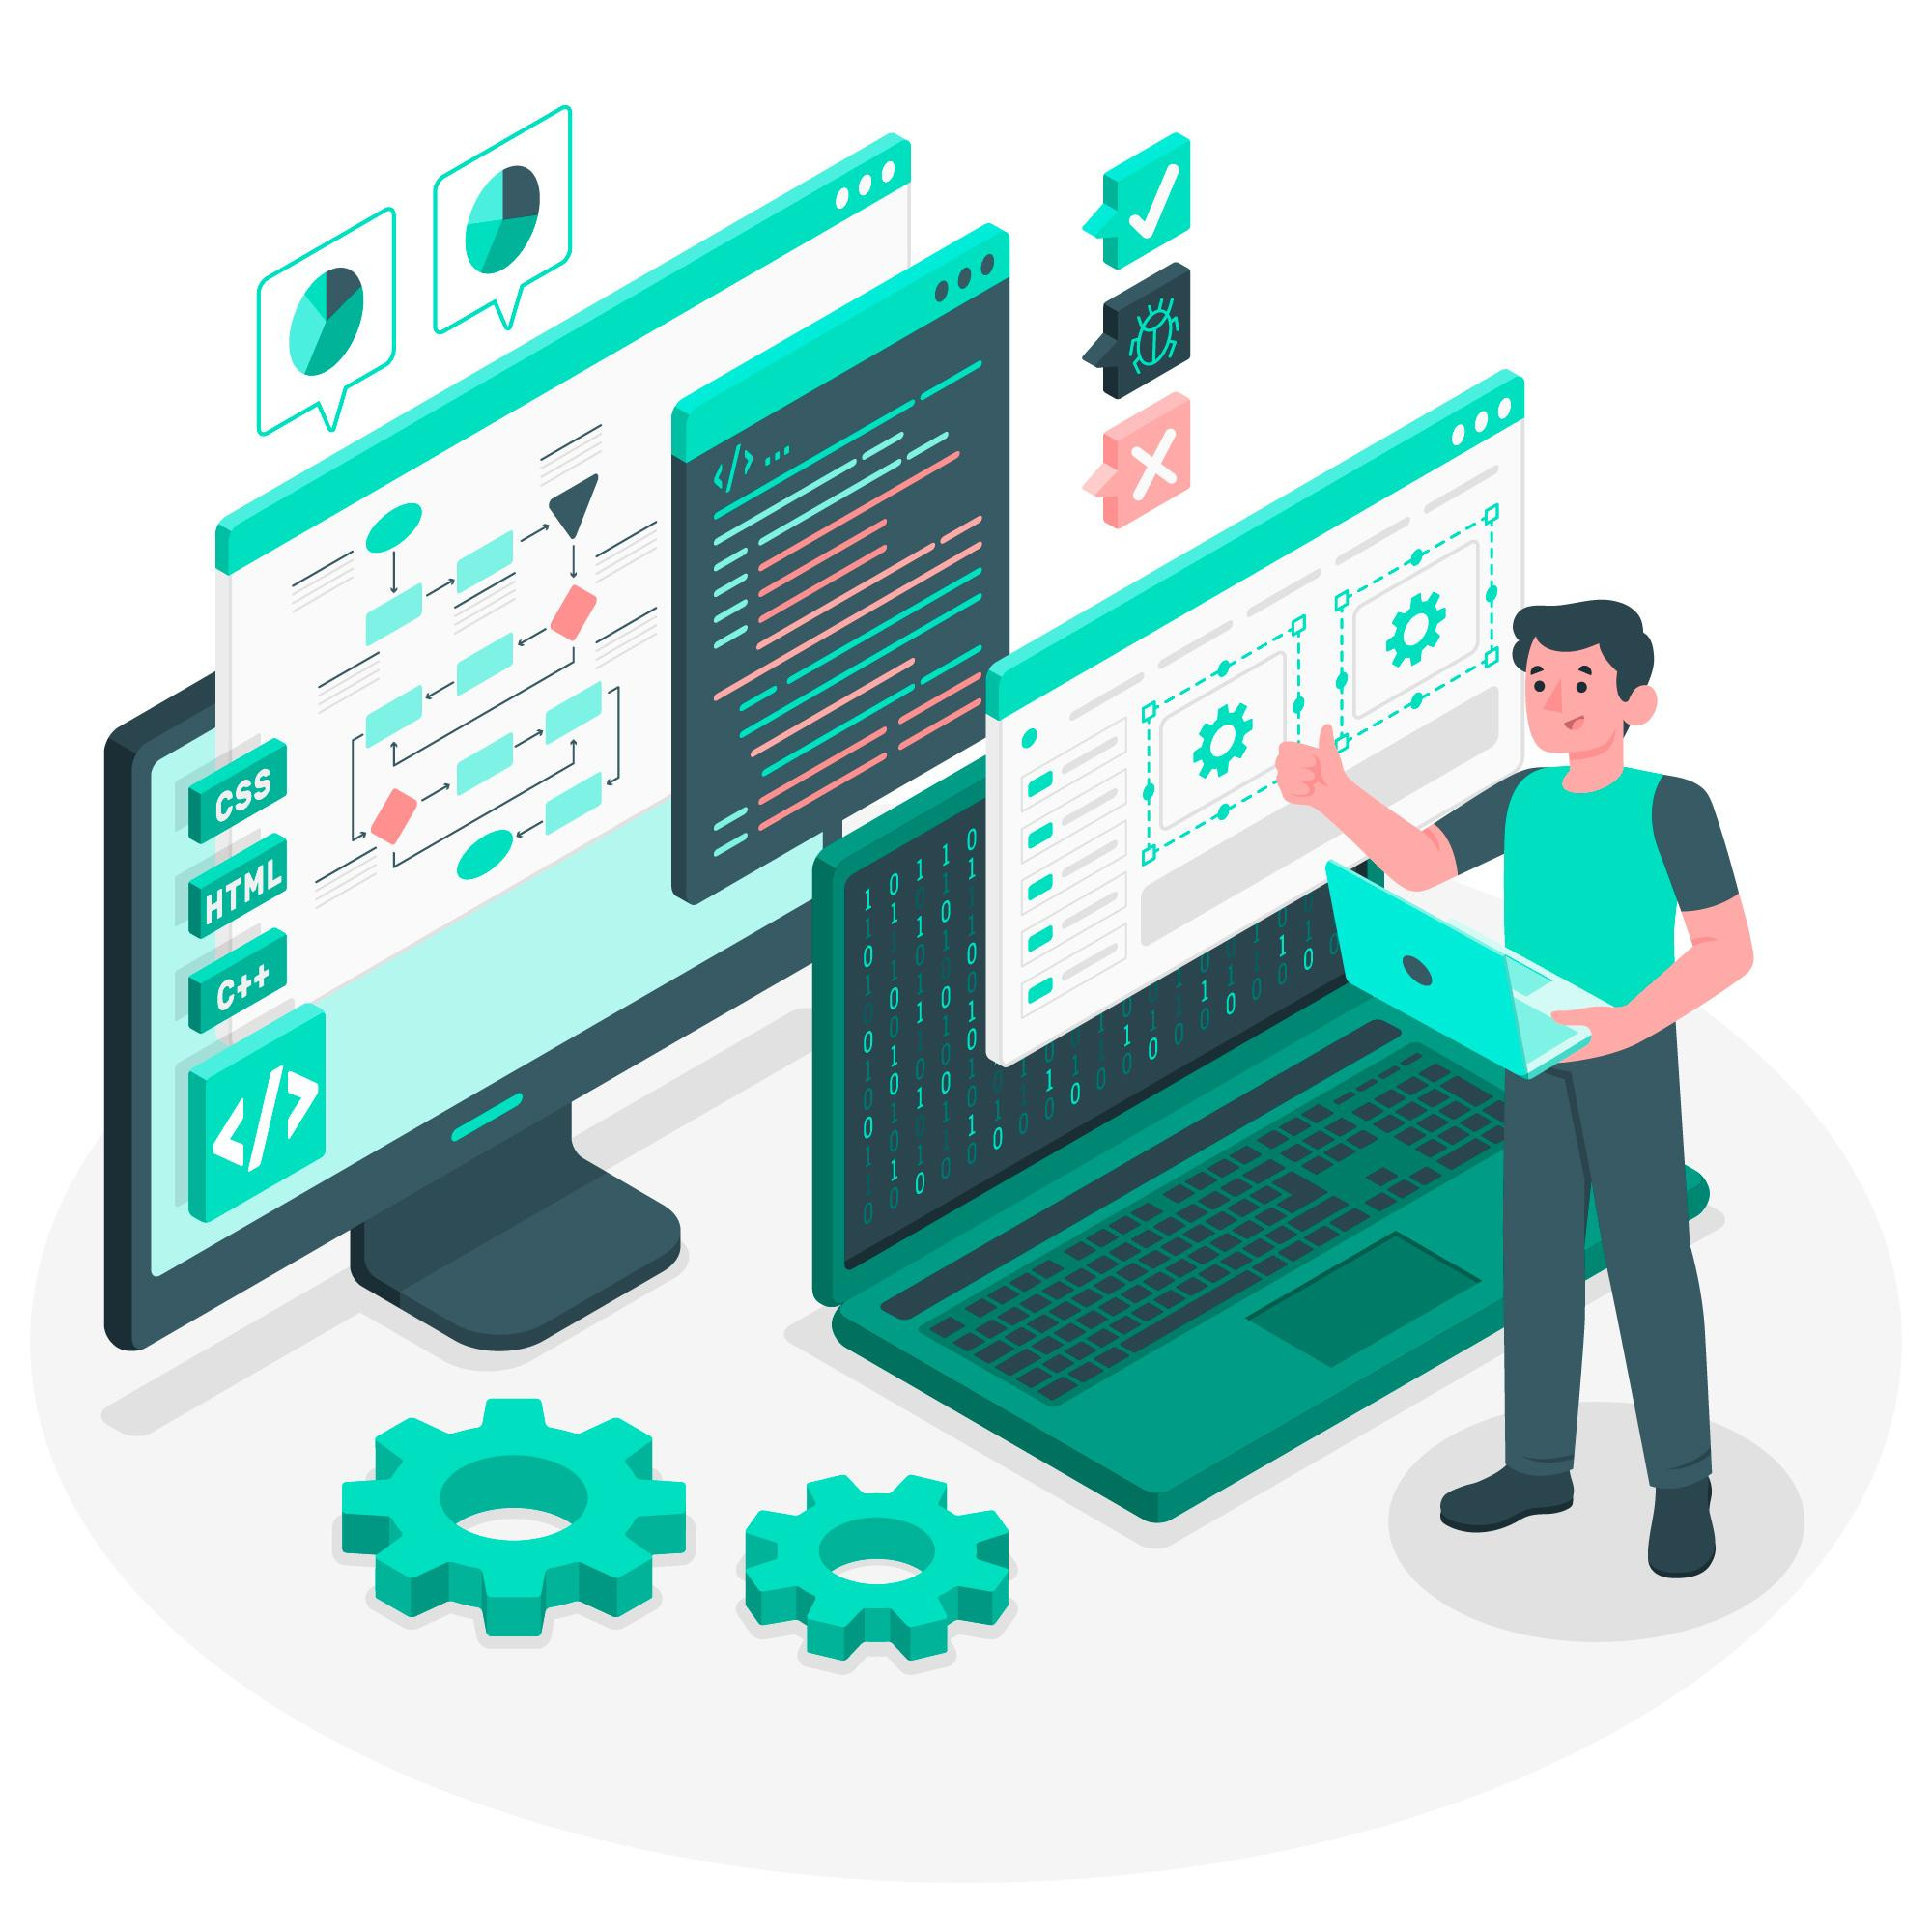 ASP.NET Development Company